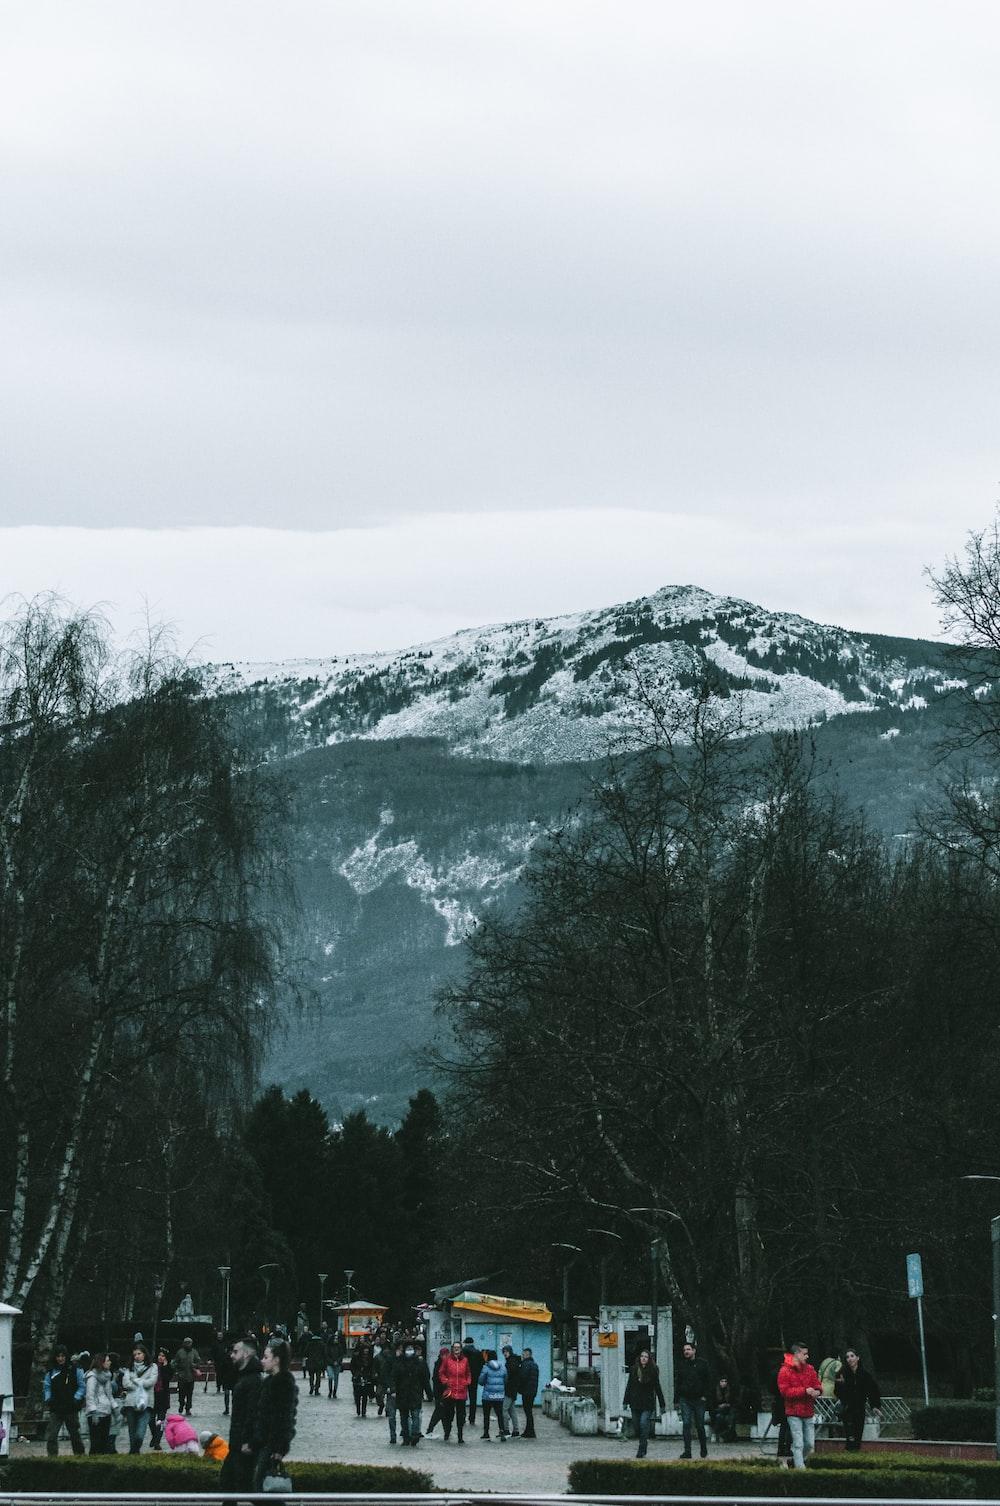 green trees near mountain during daytime